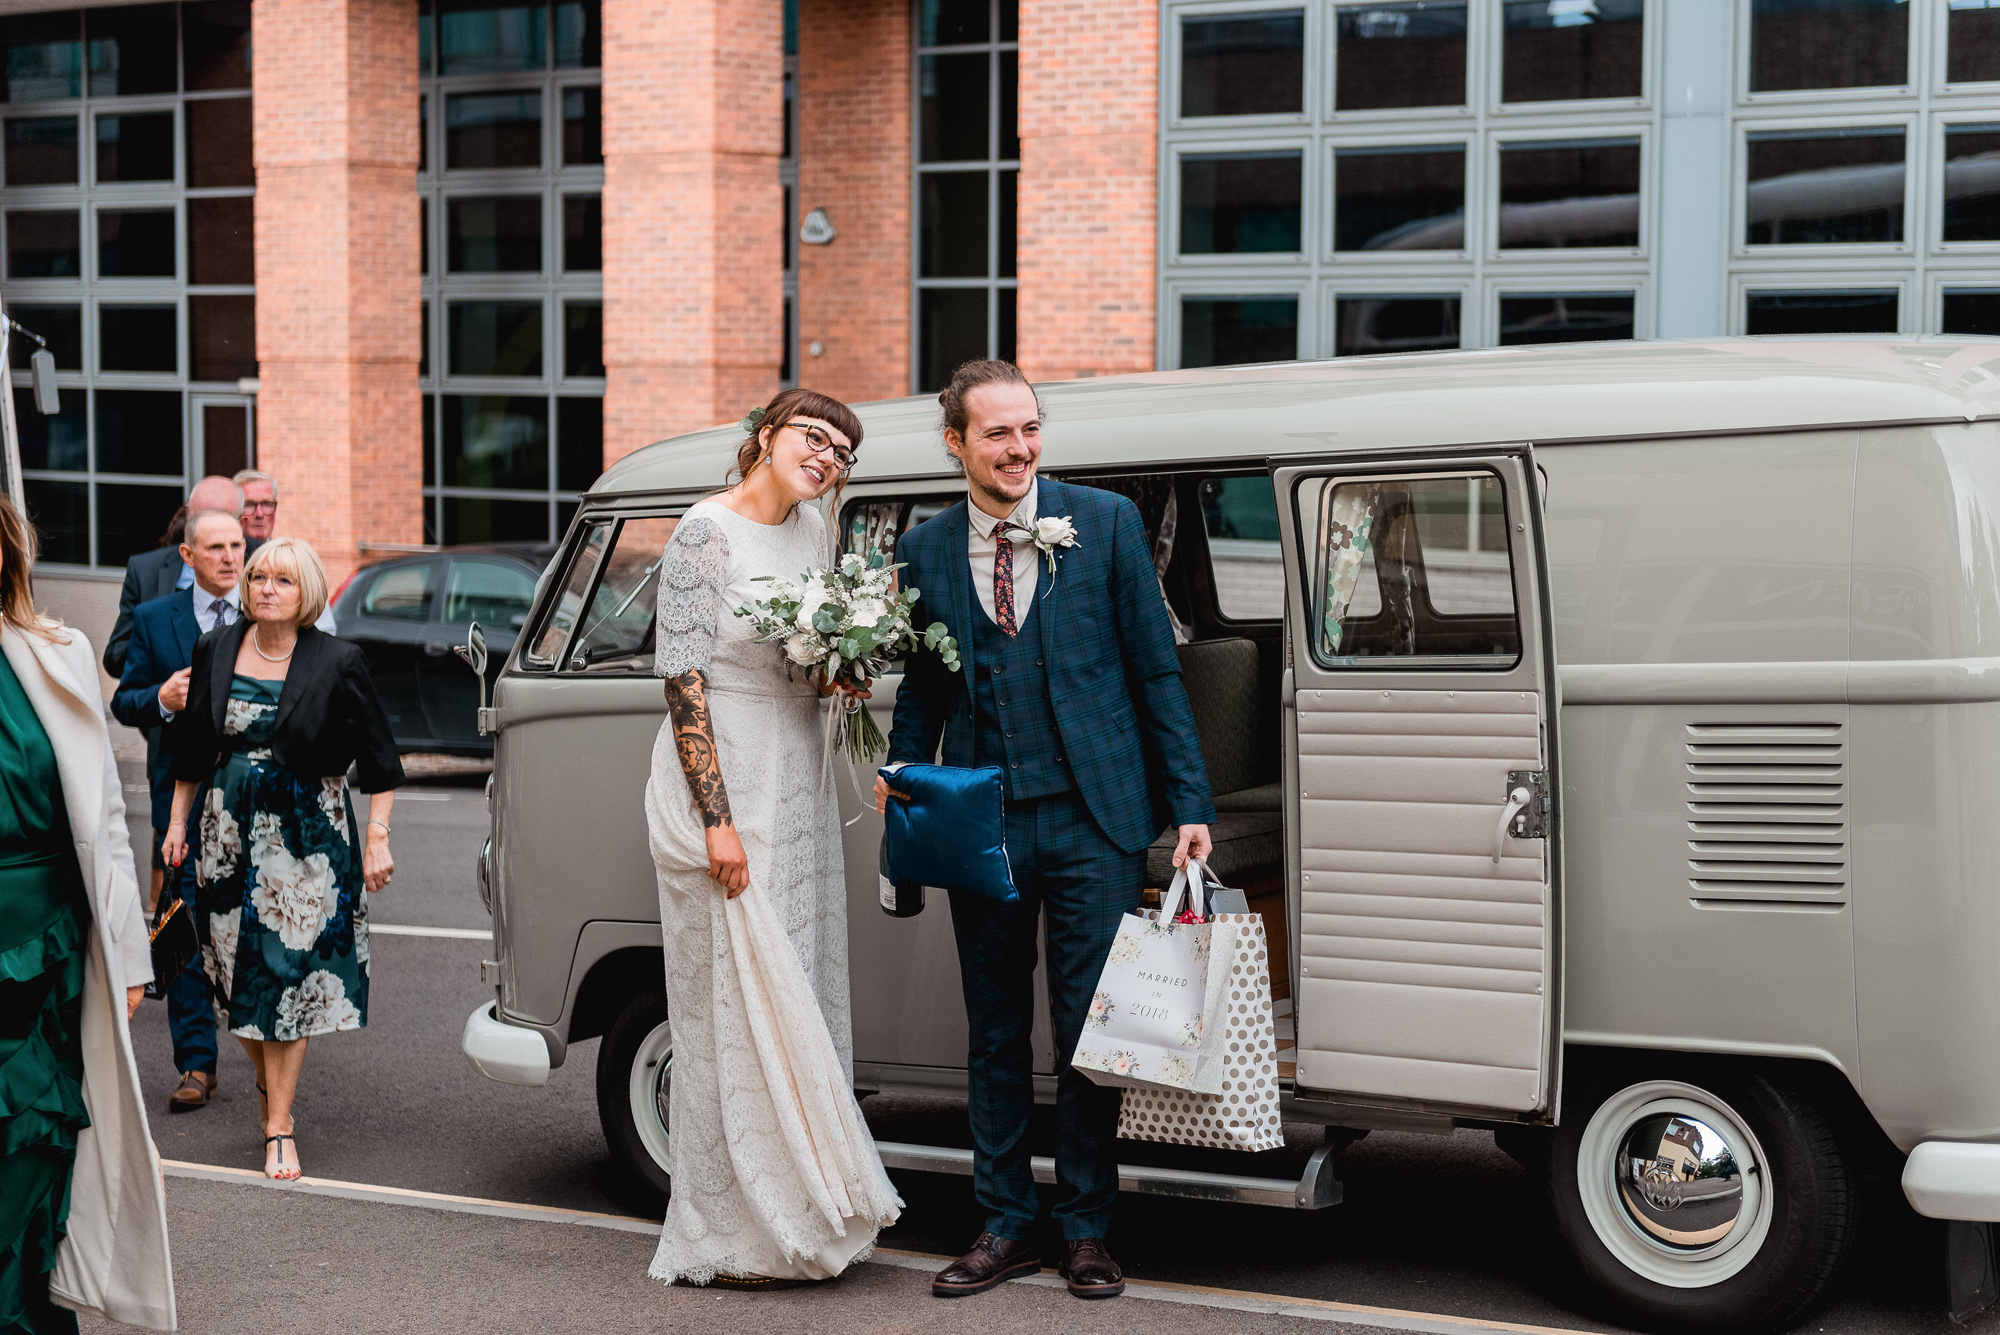 Harriet-Dahlia-Bespoke-Lace-Silk-Bohemian-Wedding-Dress-Sleeves-Tattooed-Bride-Alternative-Wedding-Sheffield-26.jpg